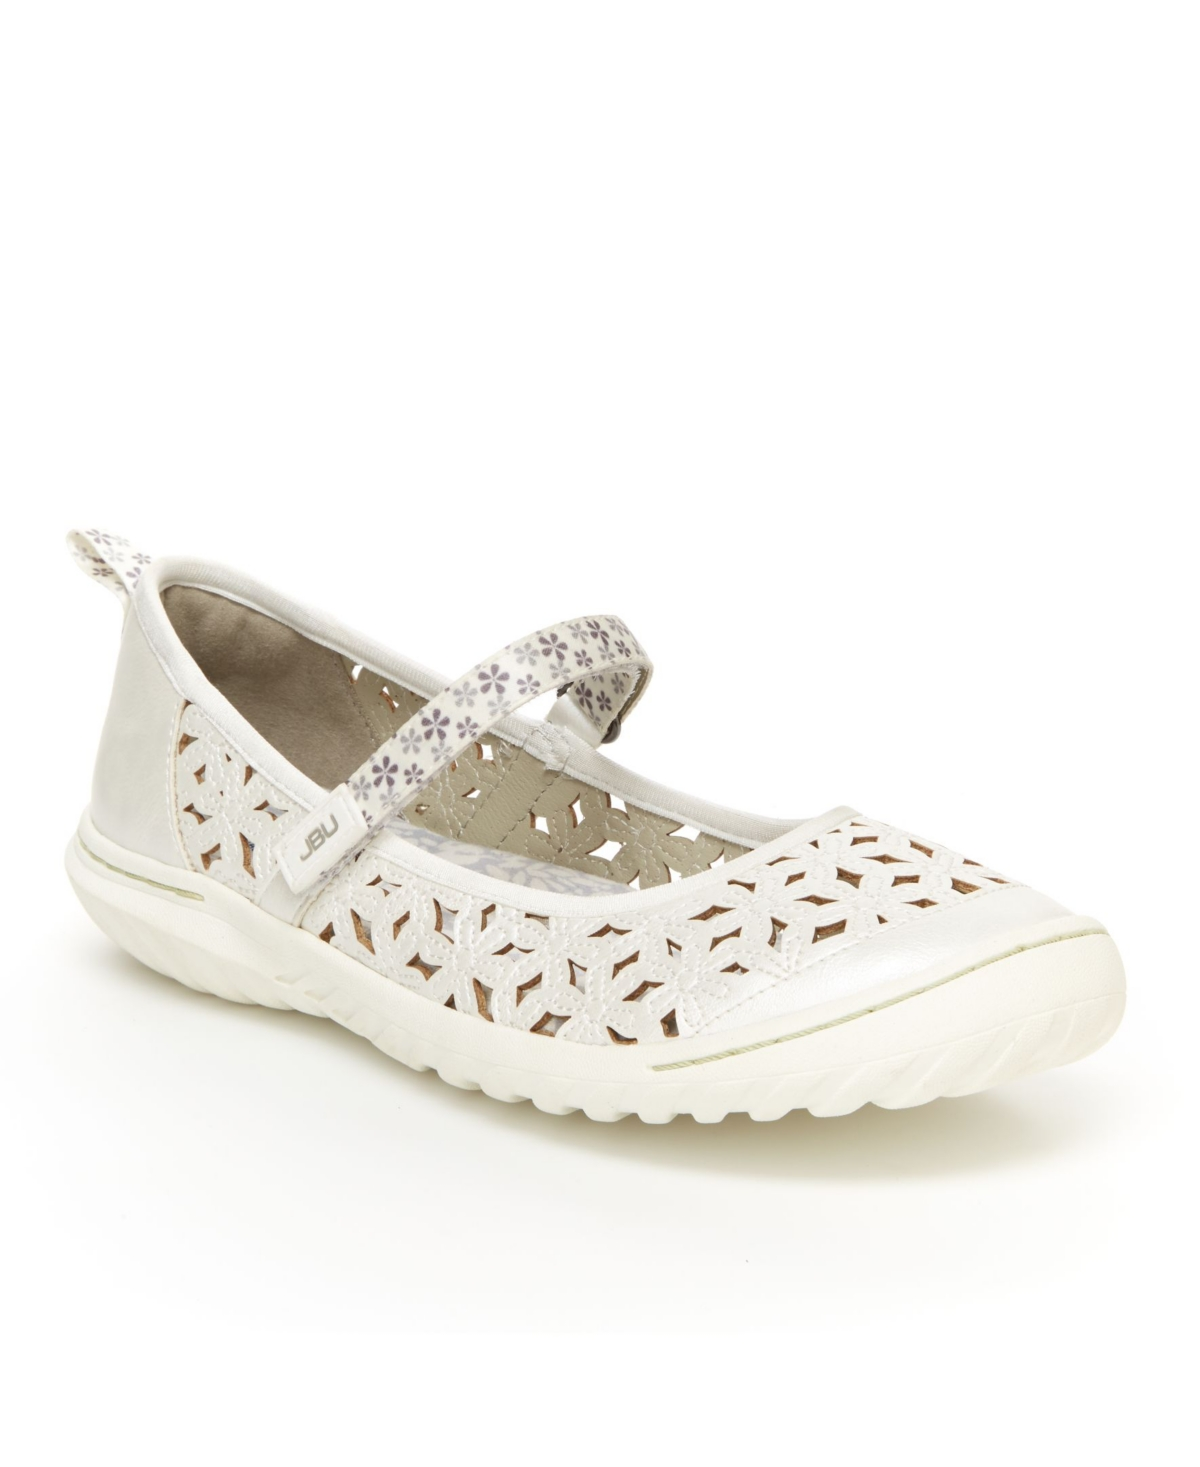 Jbu Women's Wildflower Casual Mary Jane Flats Women's Shoes